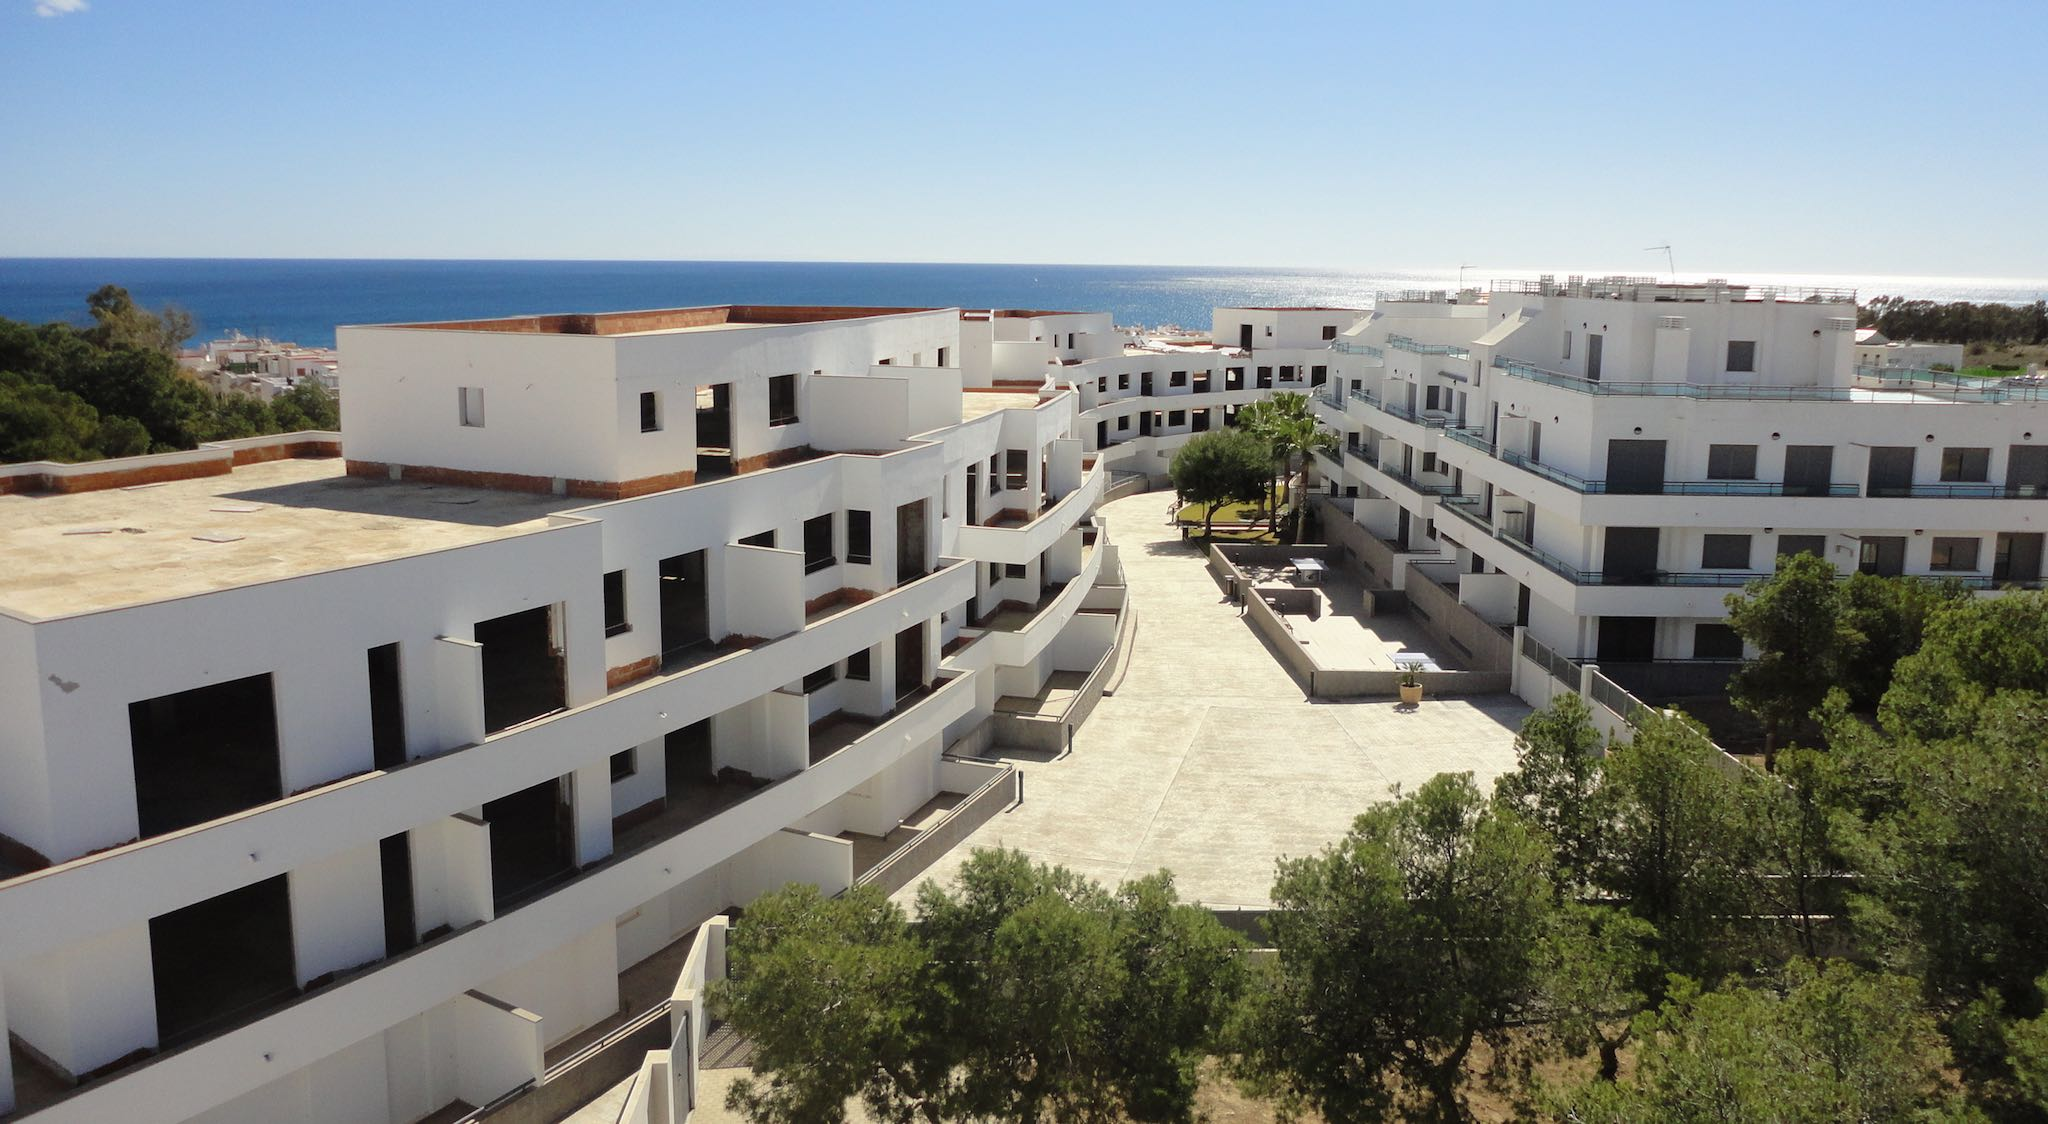 spanish new development off-plan deposit claim back your money lost